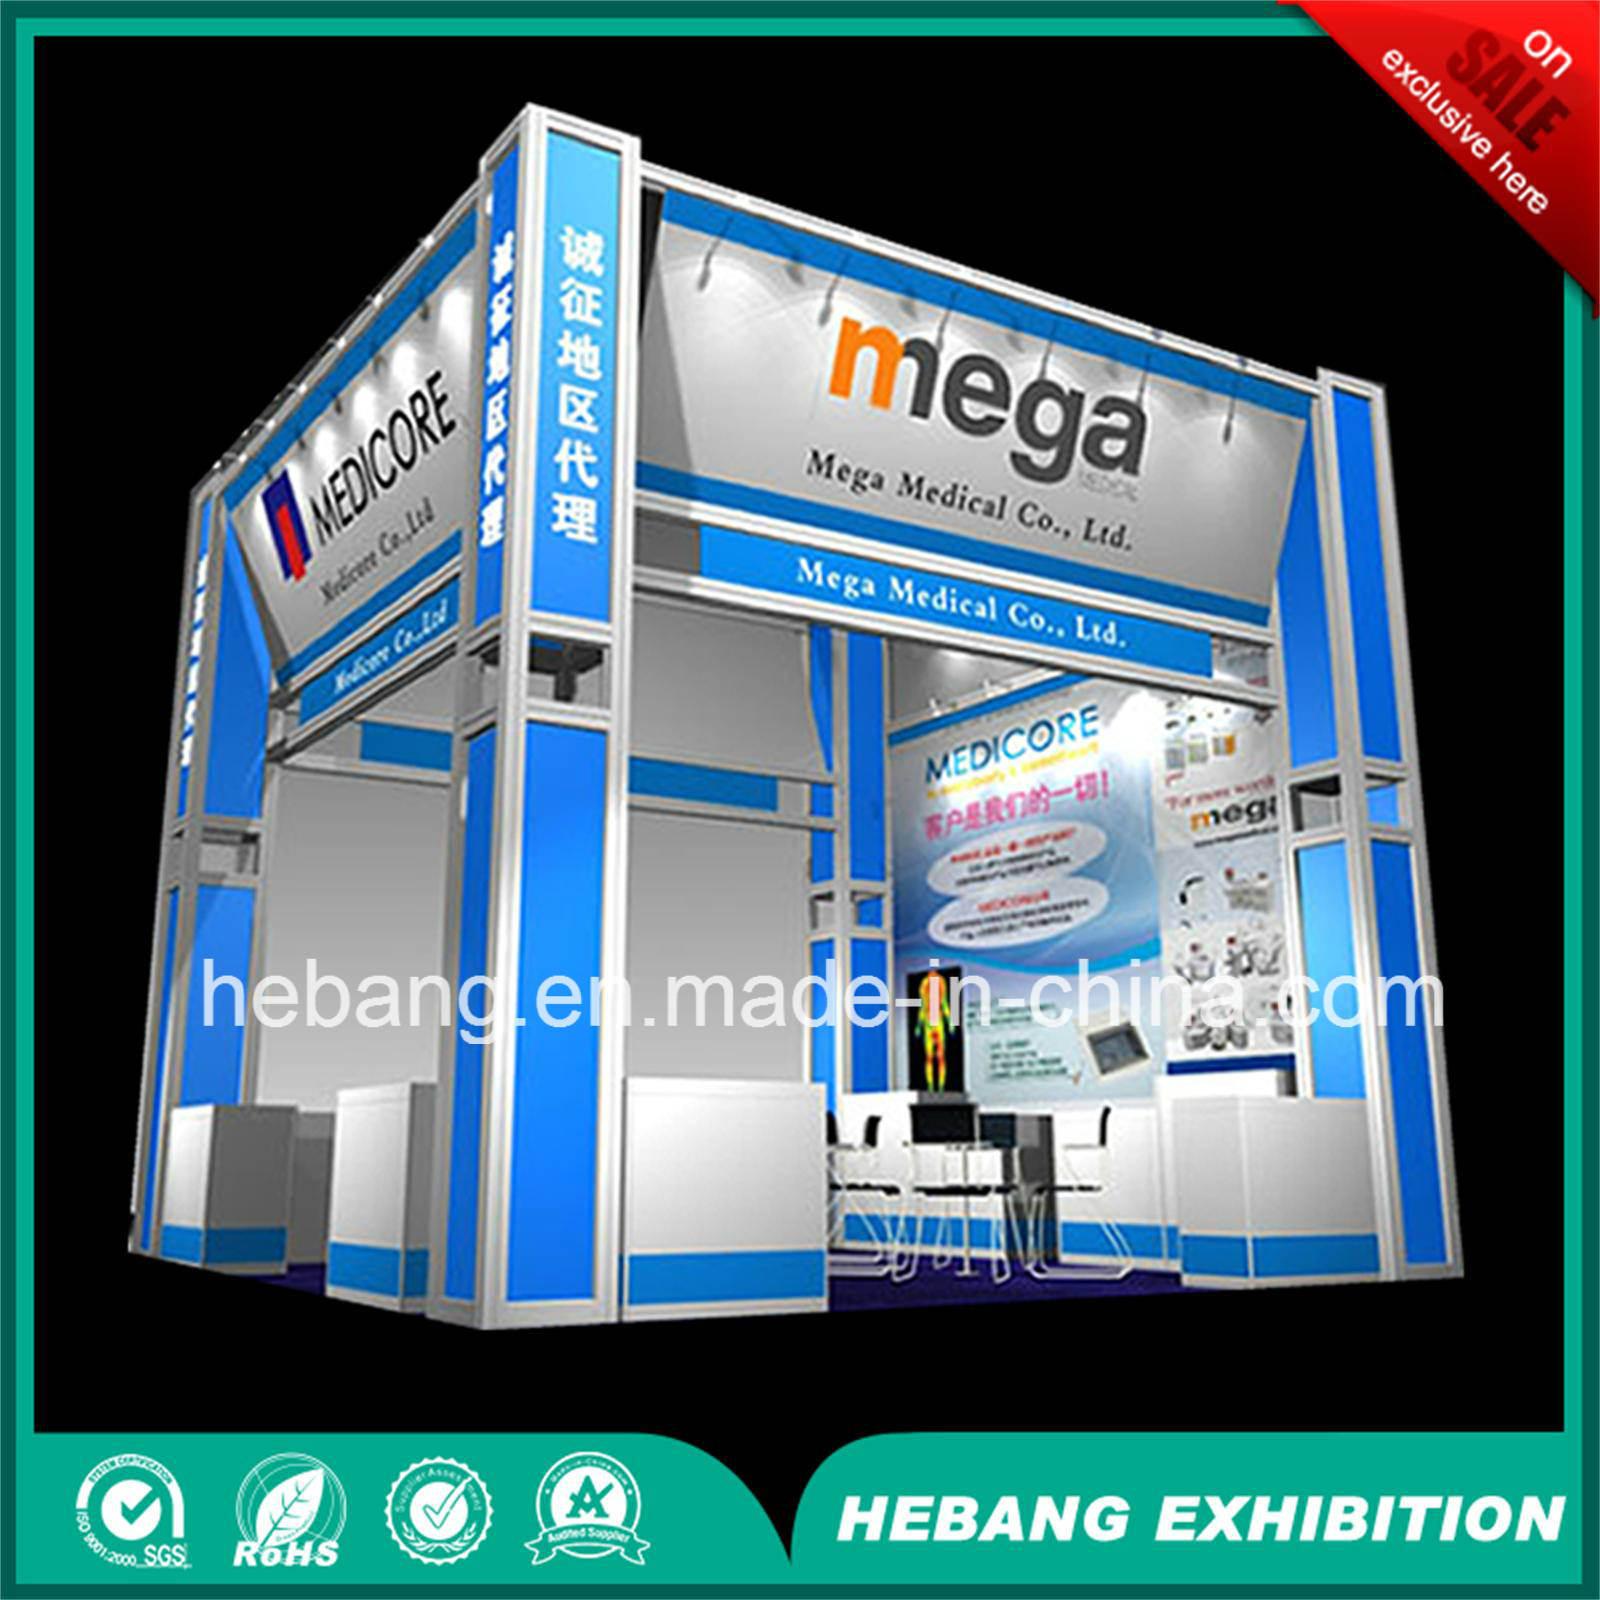 [Hot Item] Hb-Mx0076 Exhibition Booth Maxima Series